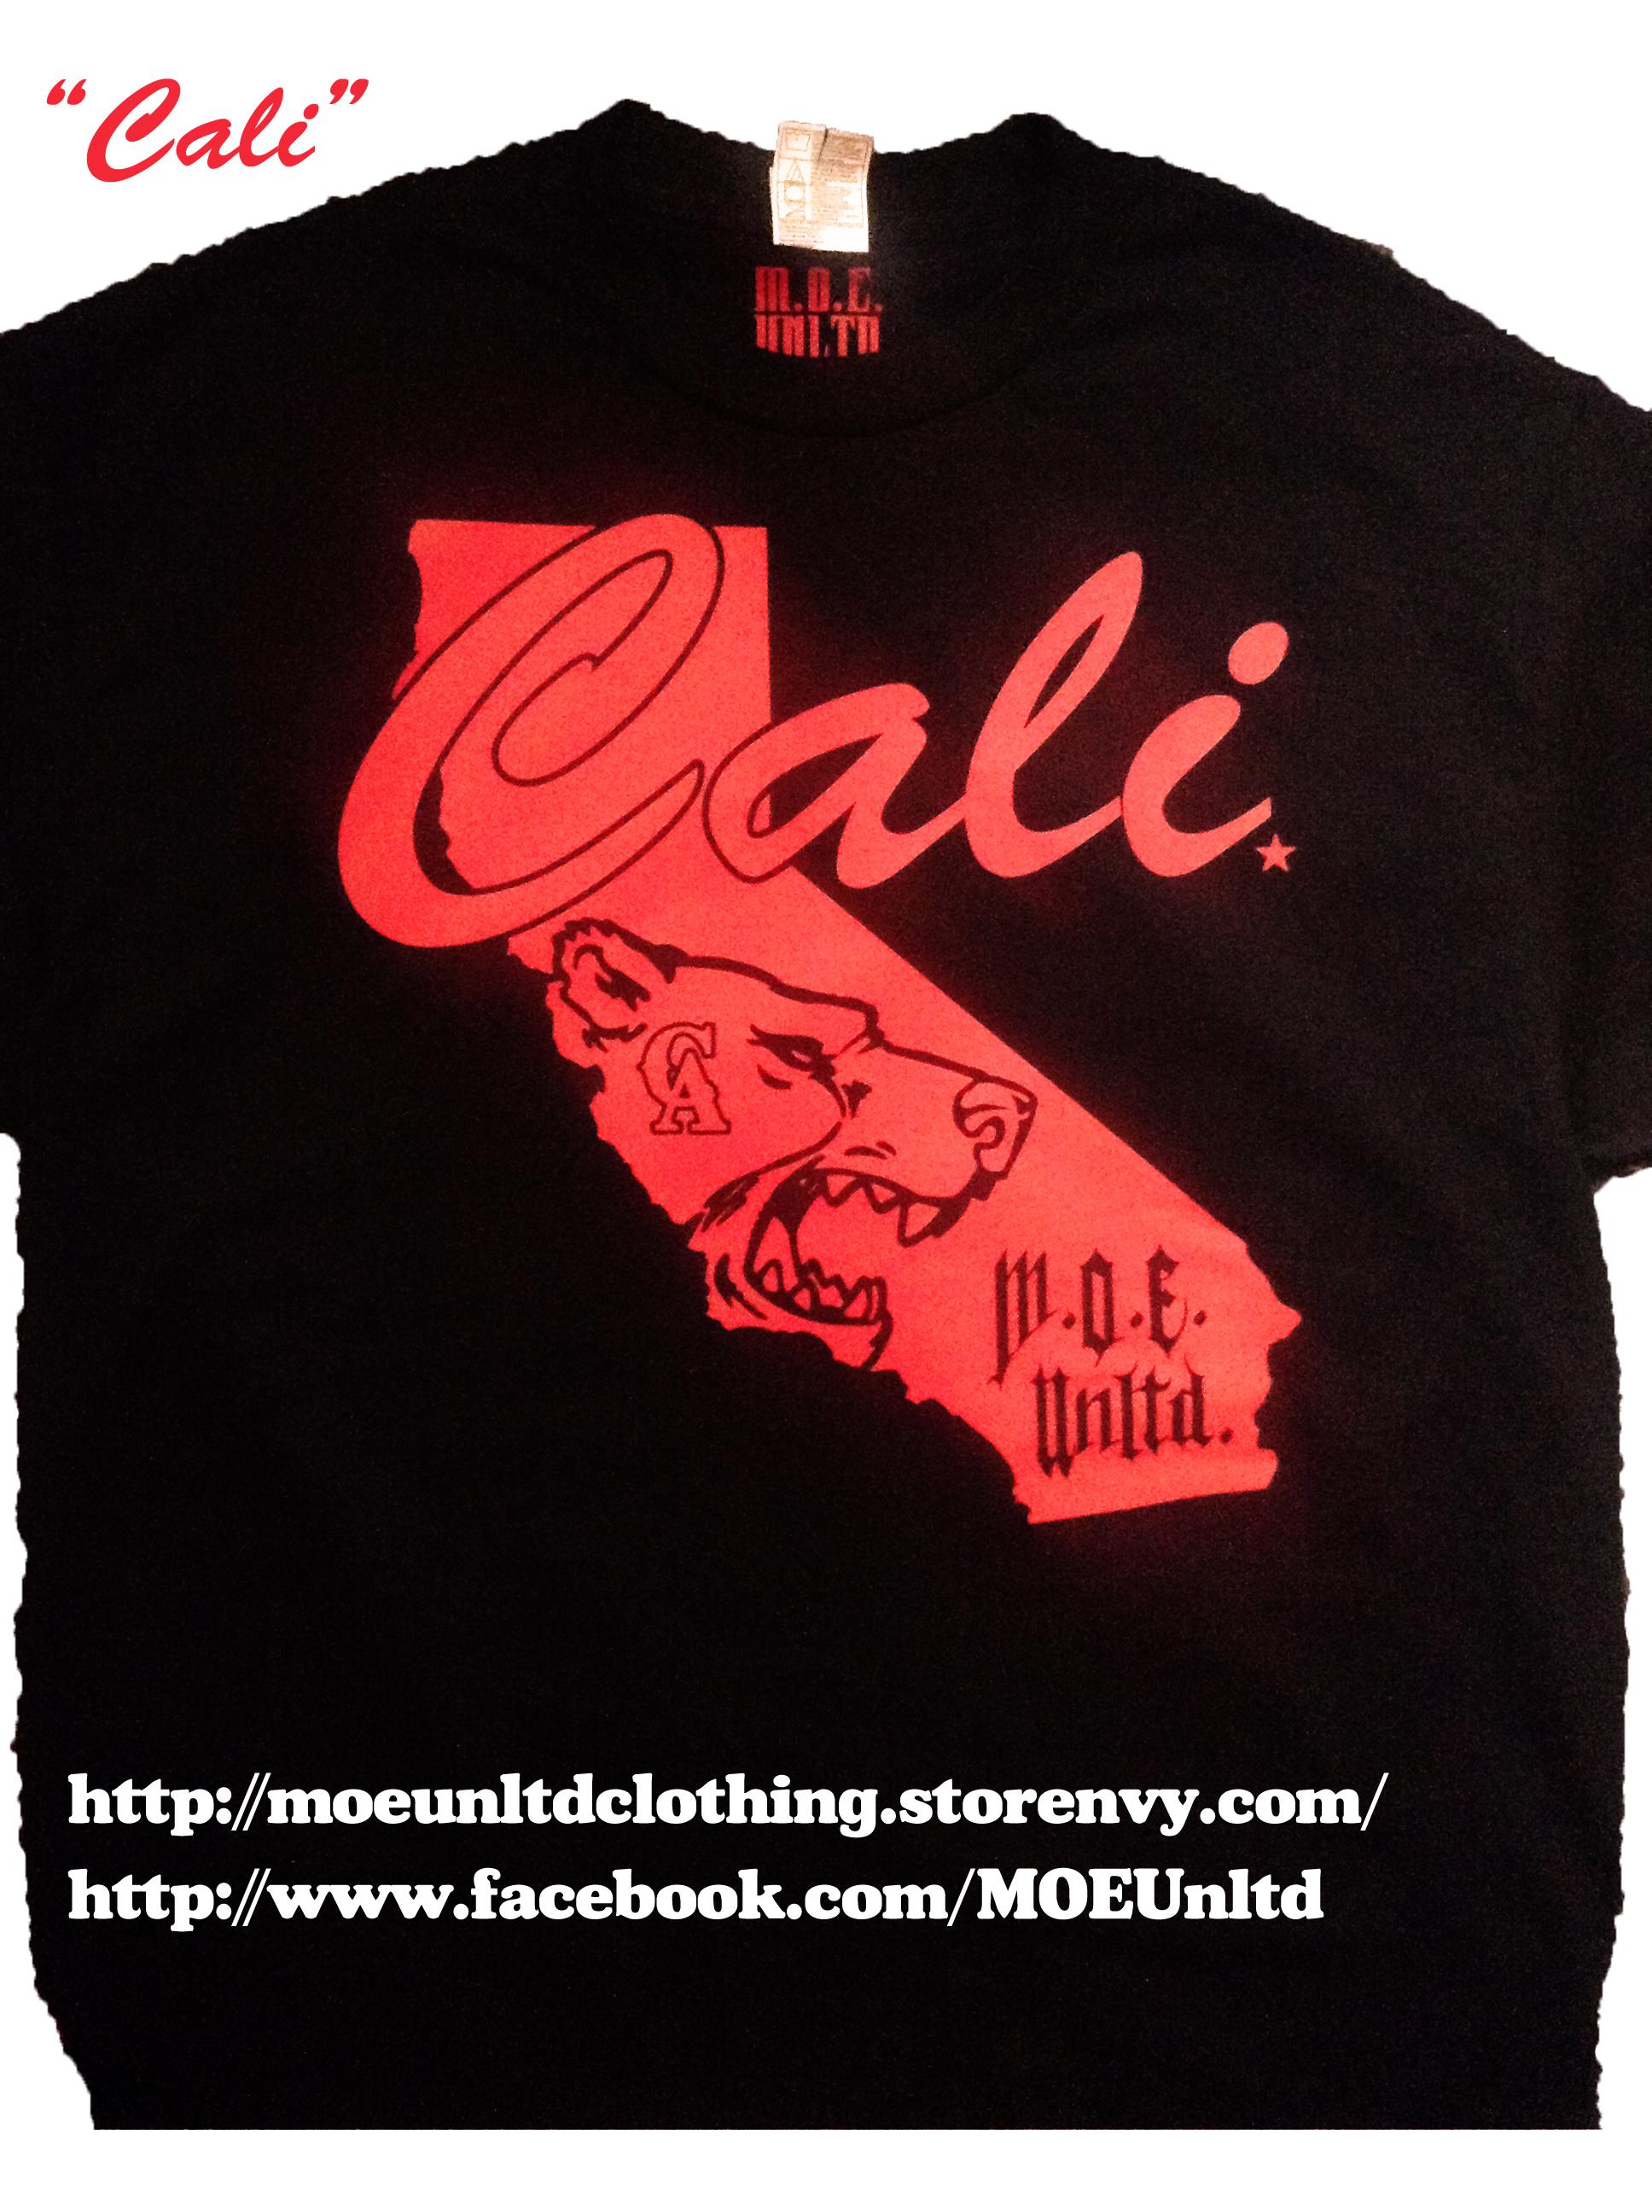 M.o.e. Unltd. Clothing | Cali Men's Black/red T-Shirt | Online Store - California Map Shirt